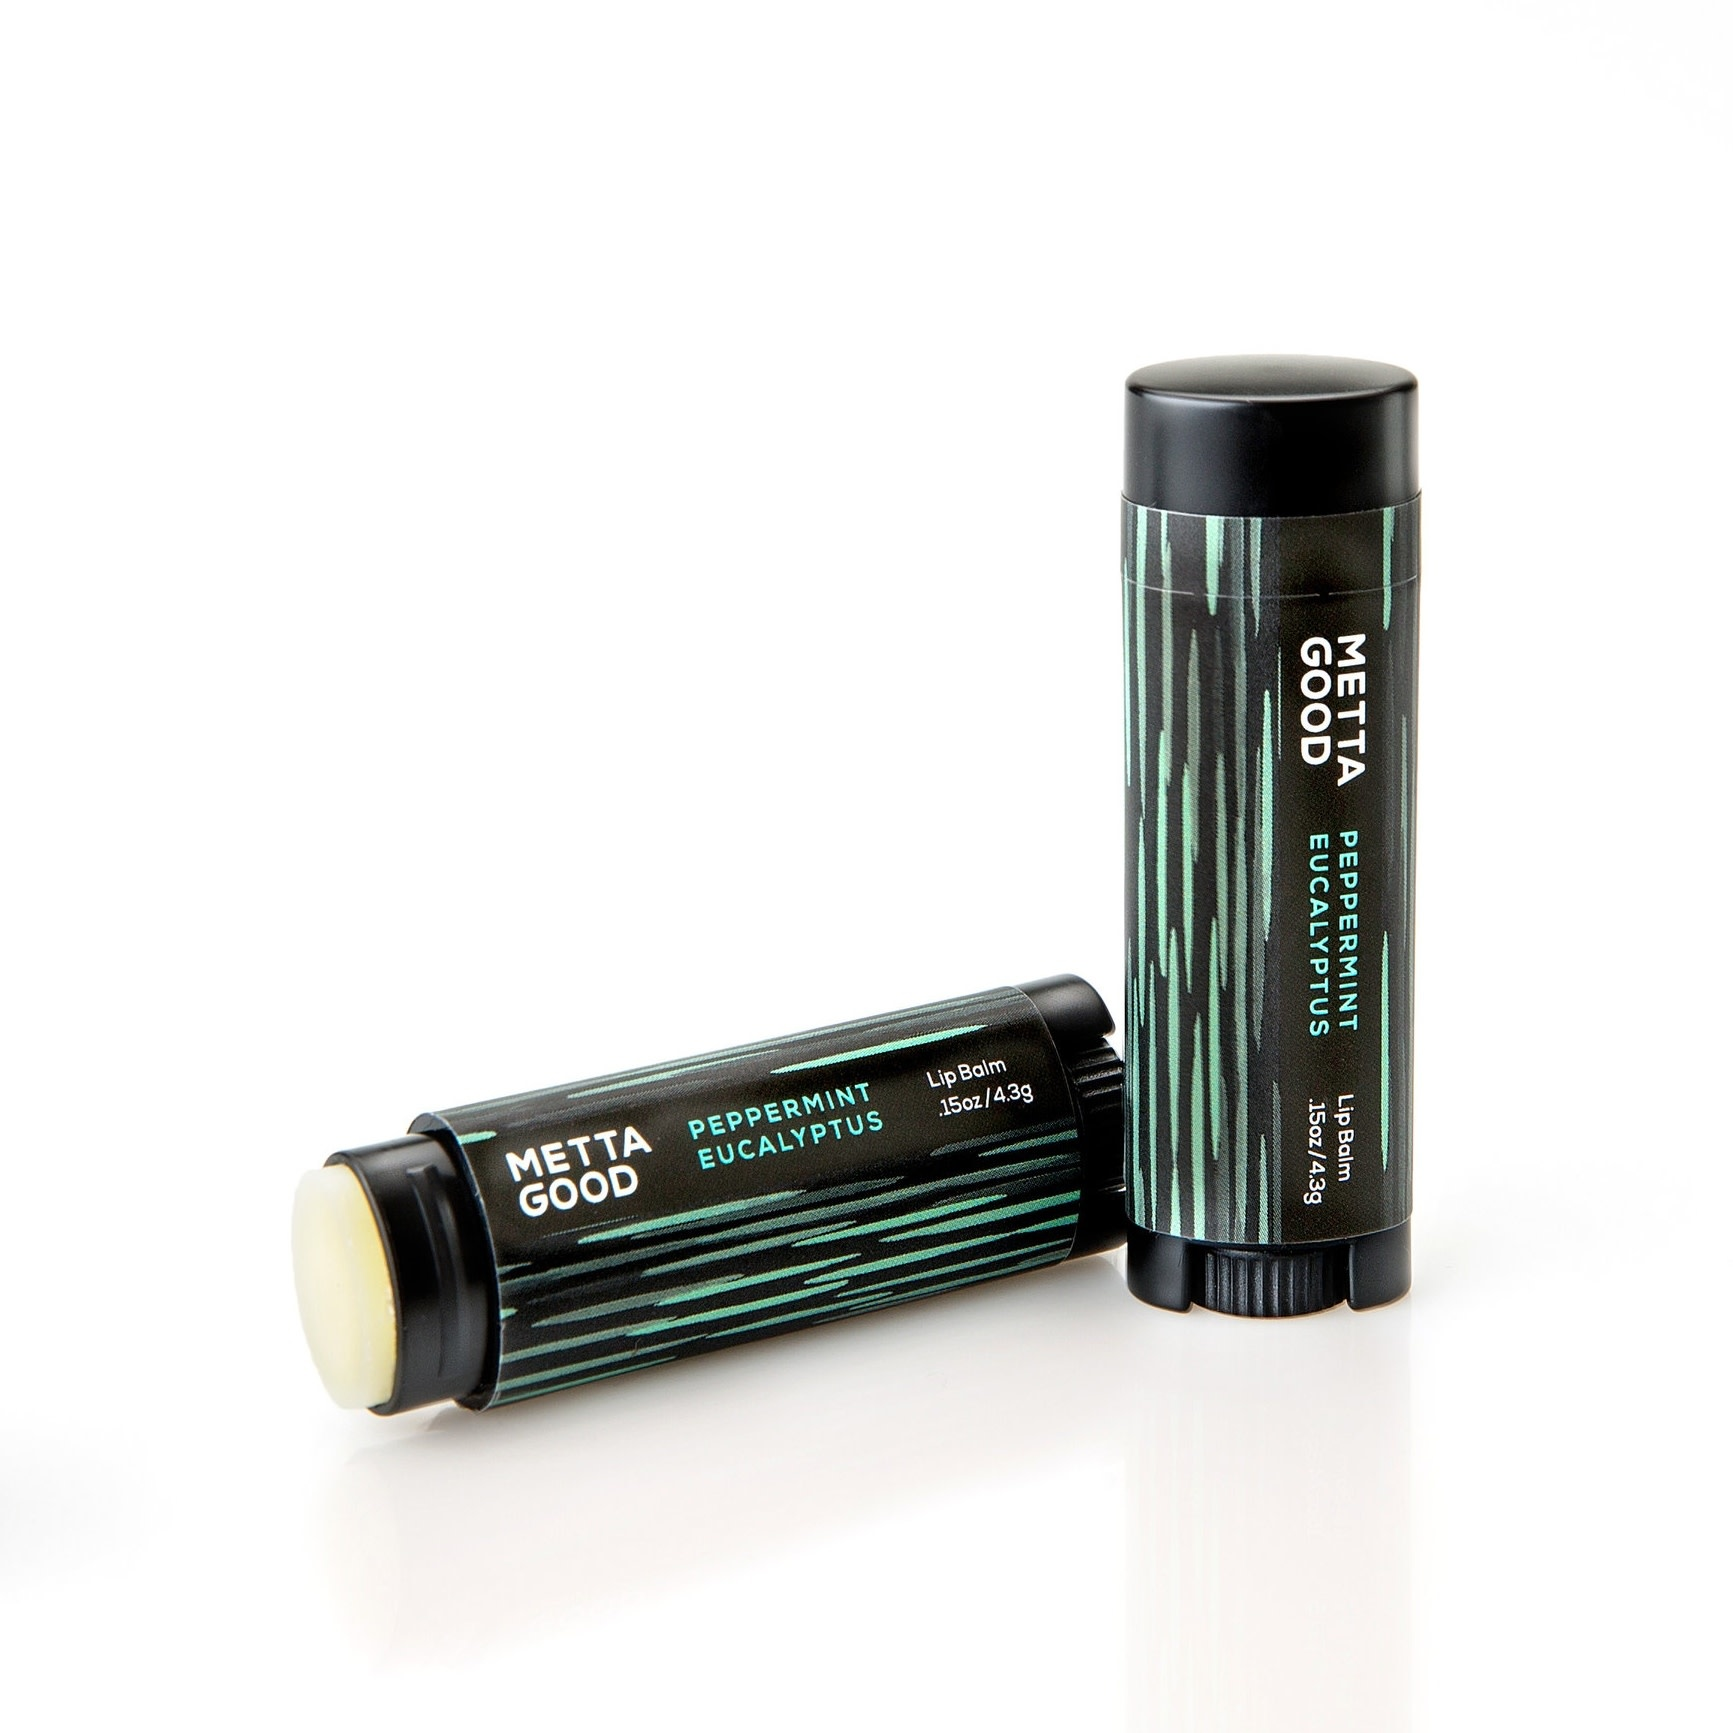 Metta Good Lip Balm | Peppermint Eucalyptus-3